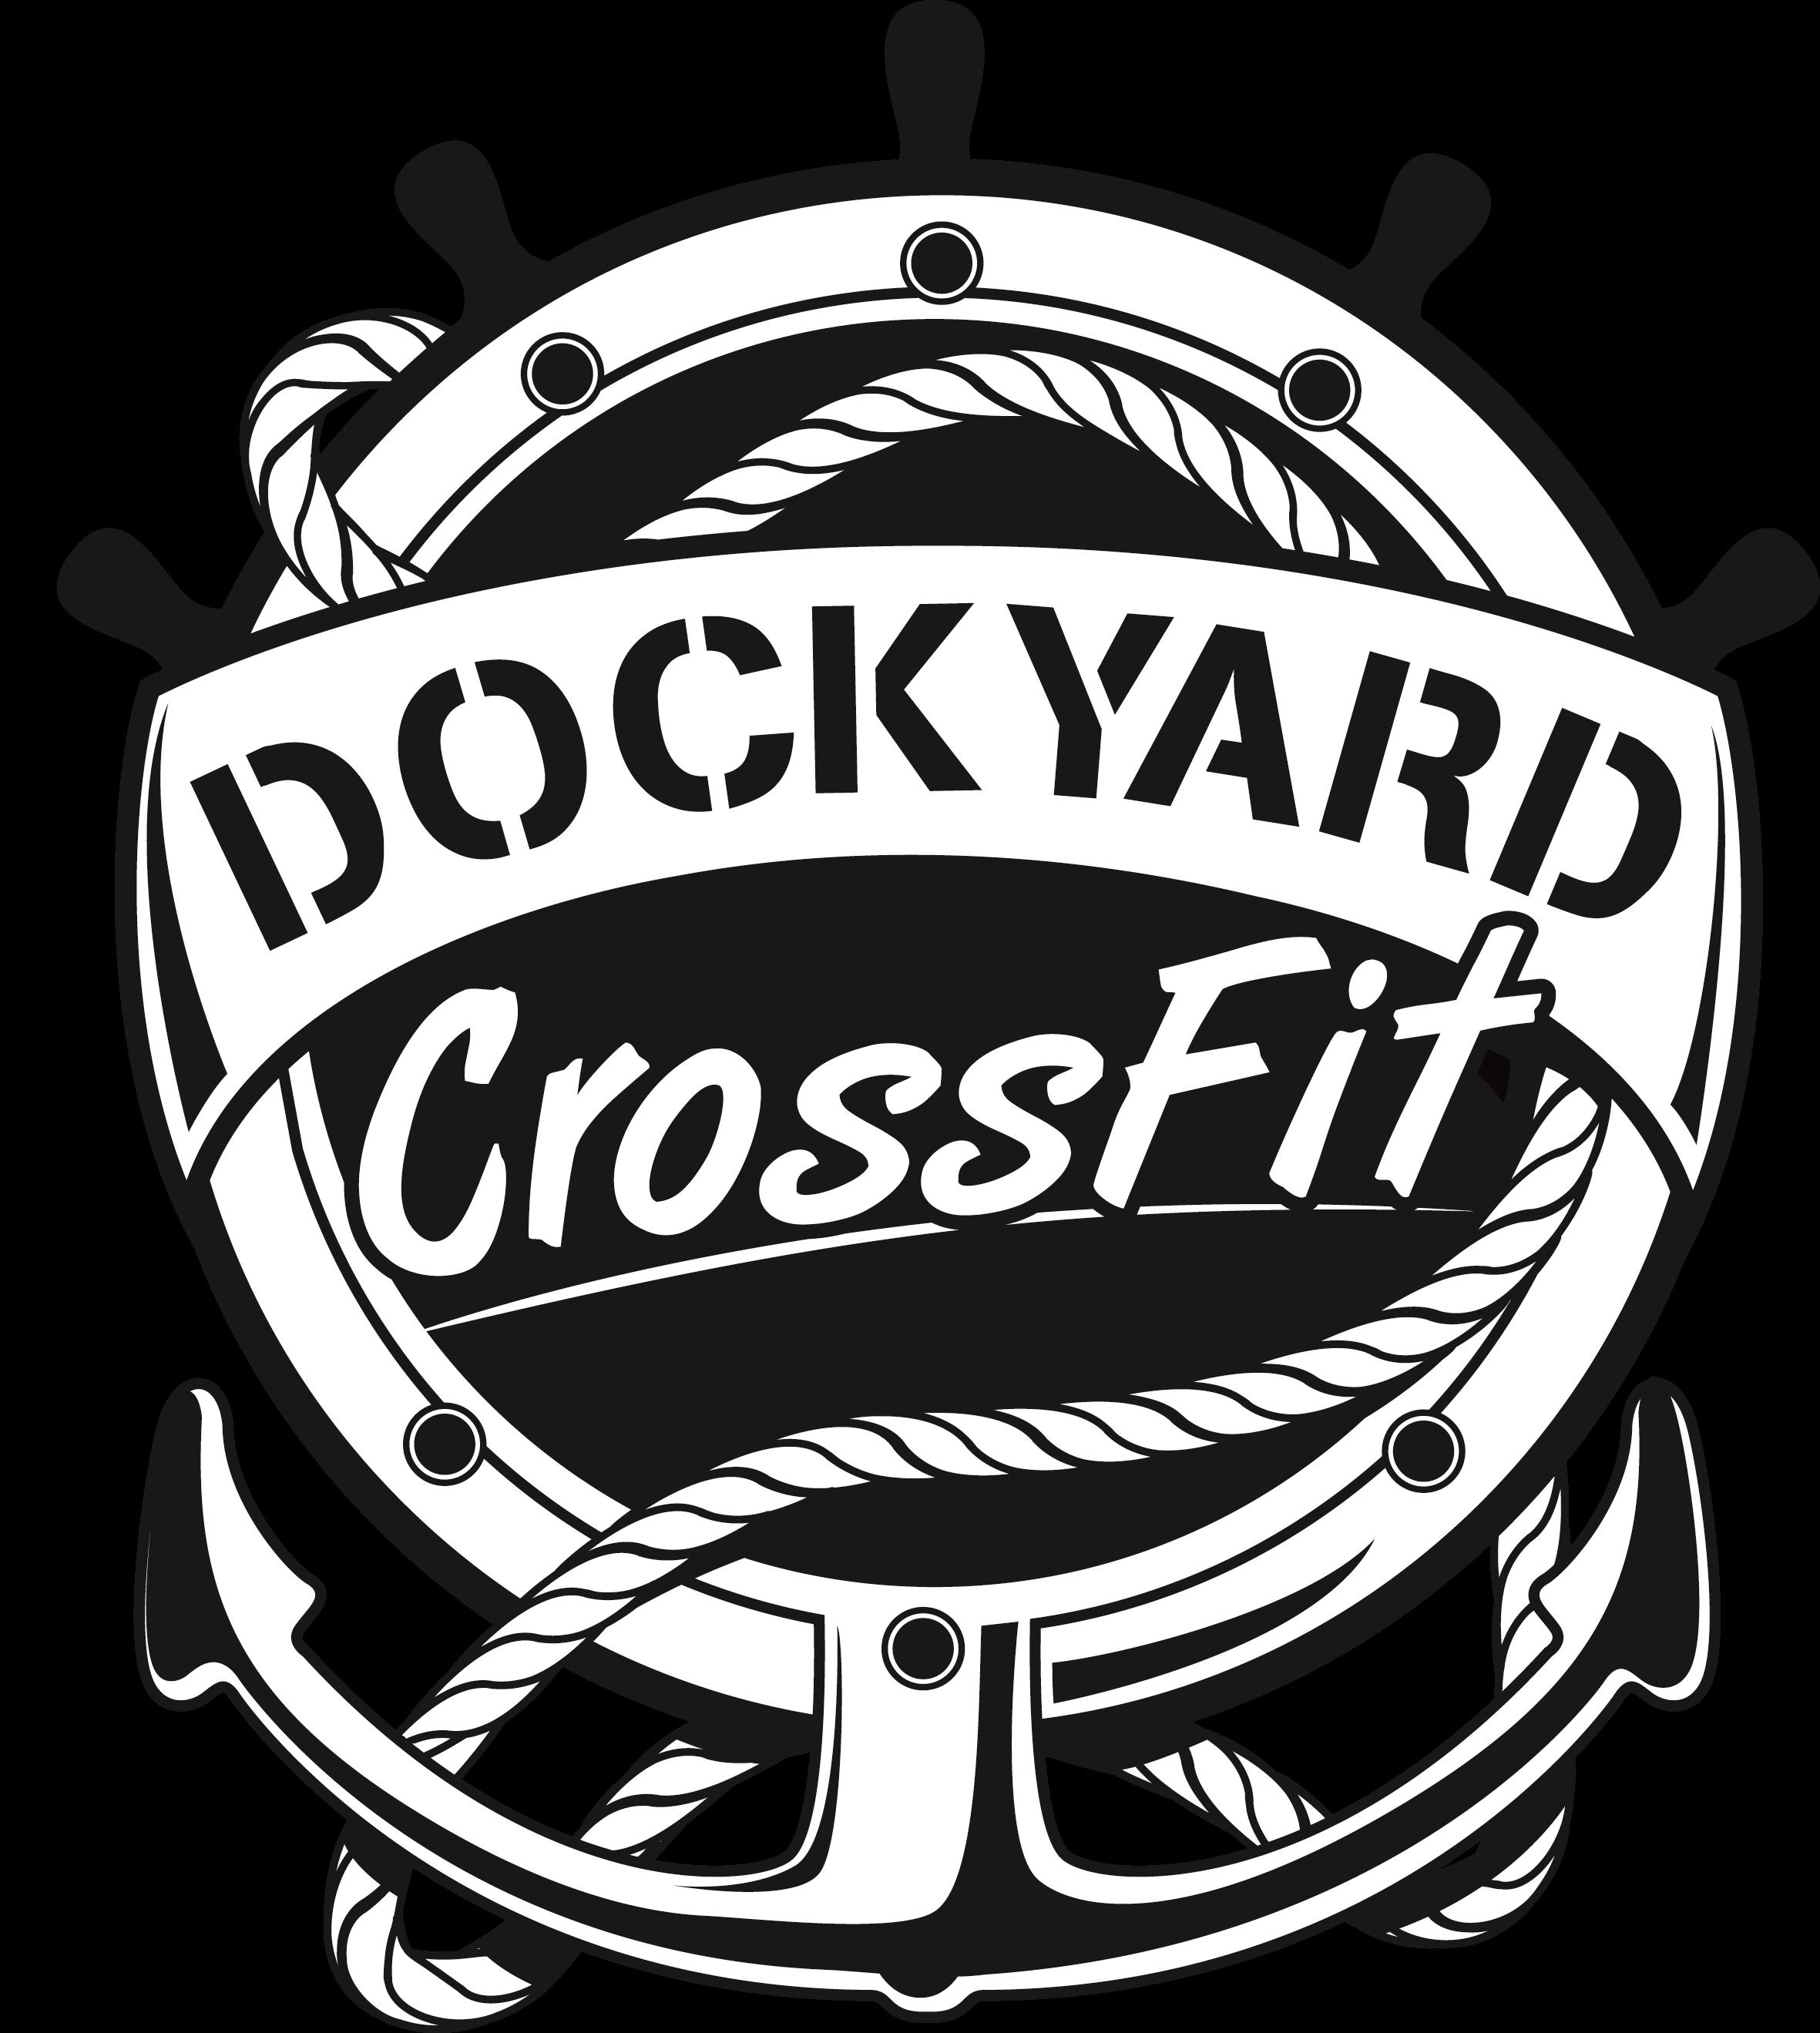 Logo Dockyard CrossFit